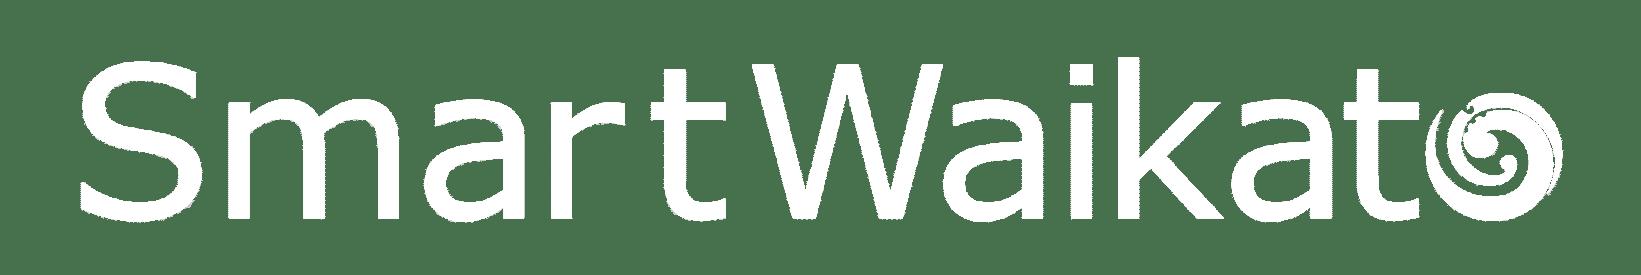 Smart Waikato Logo